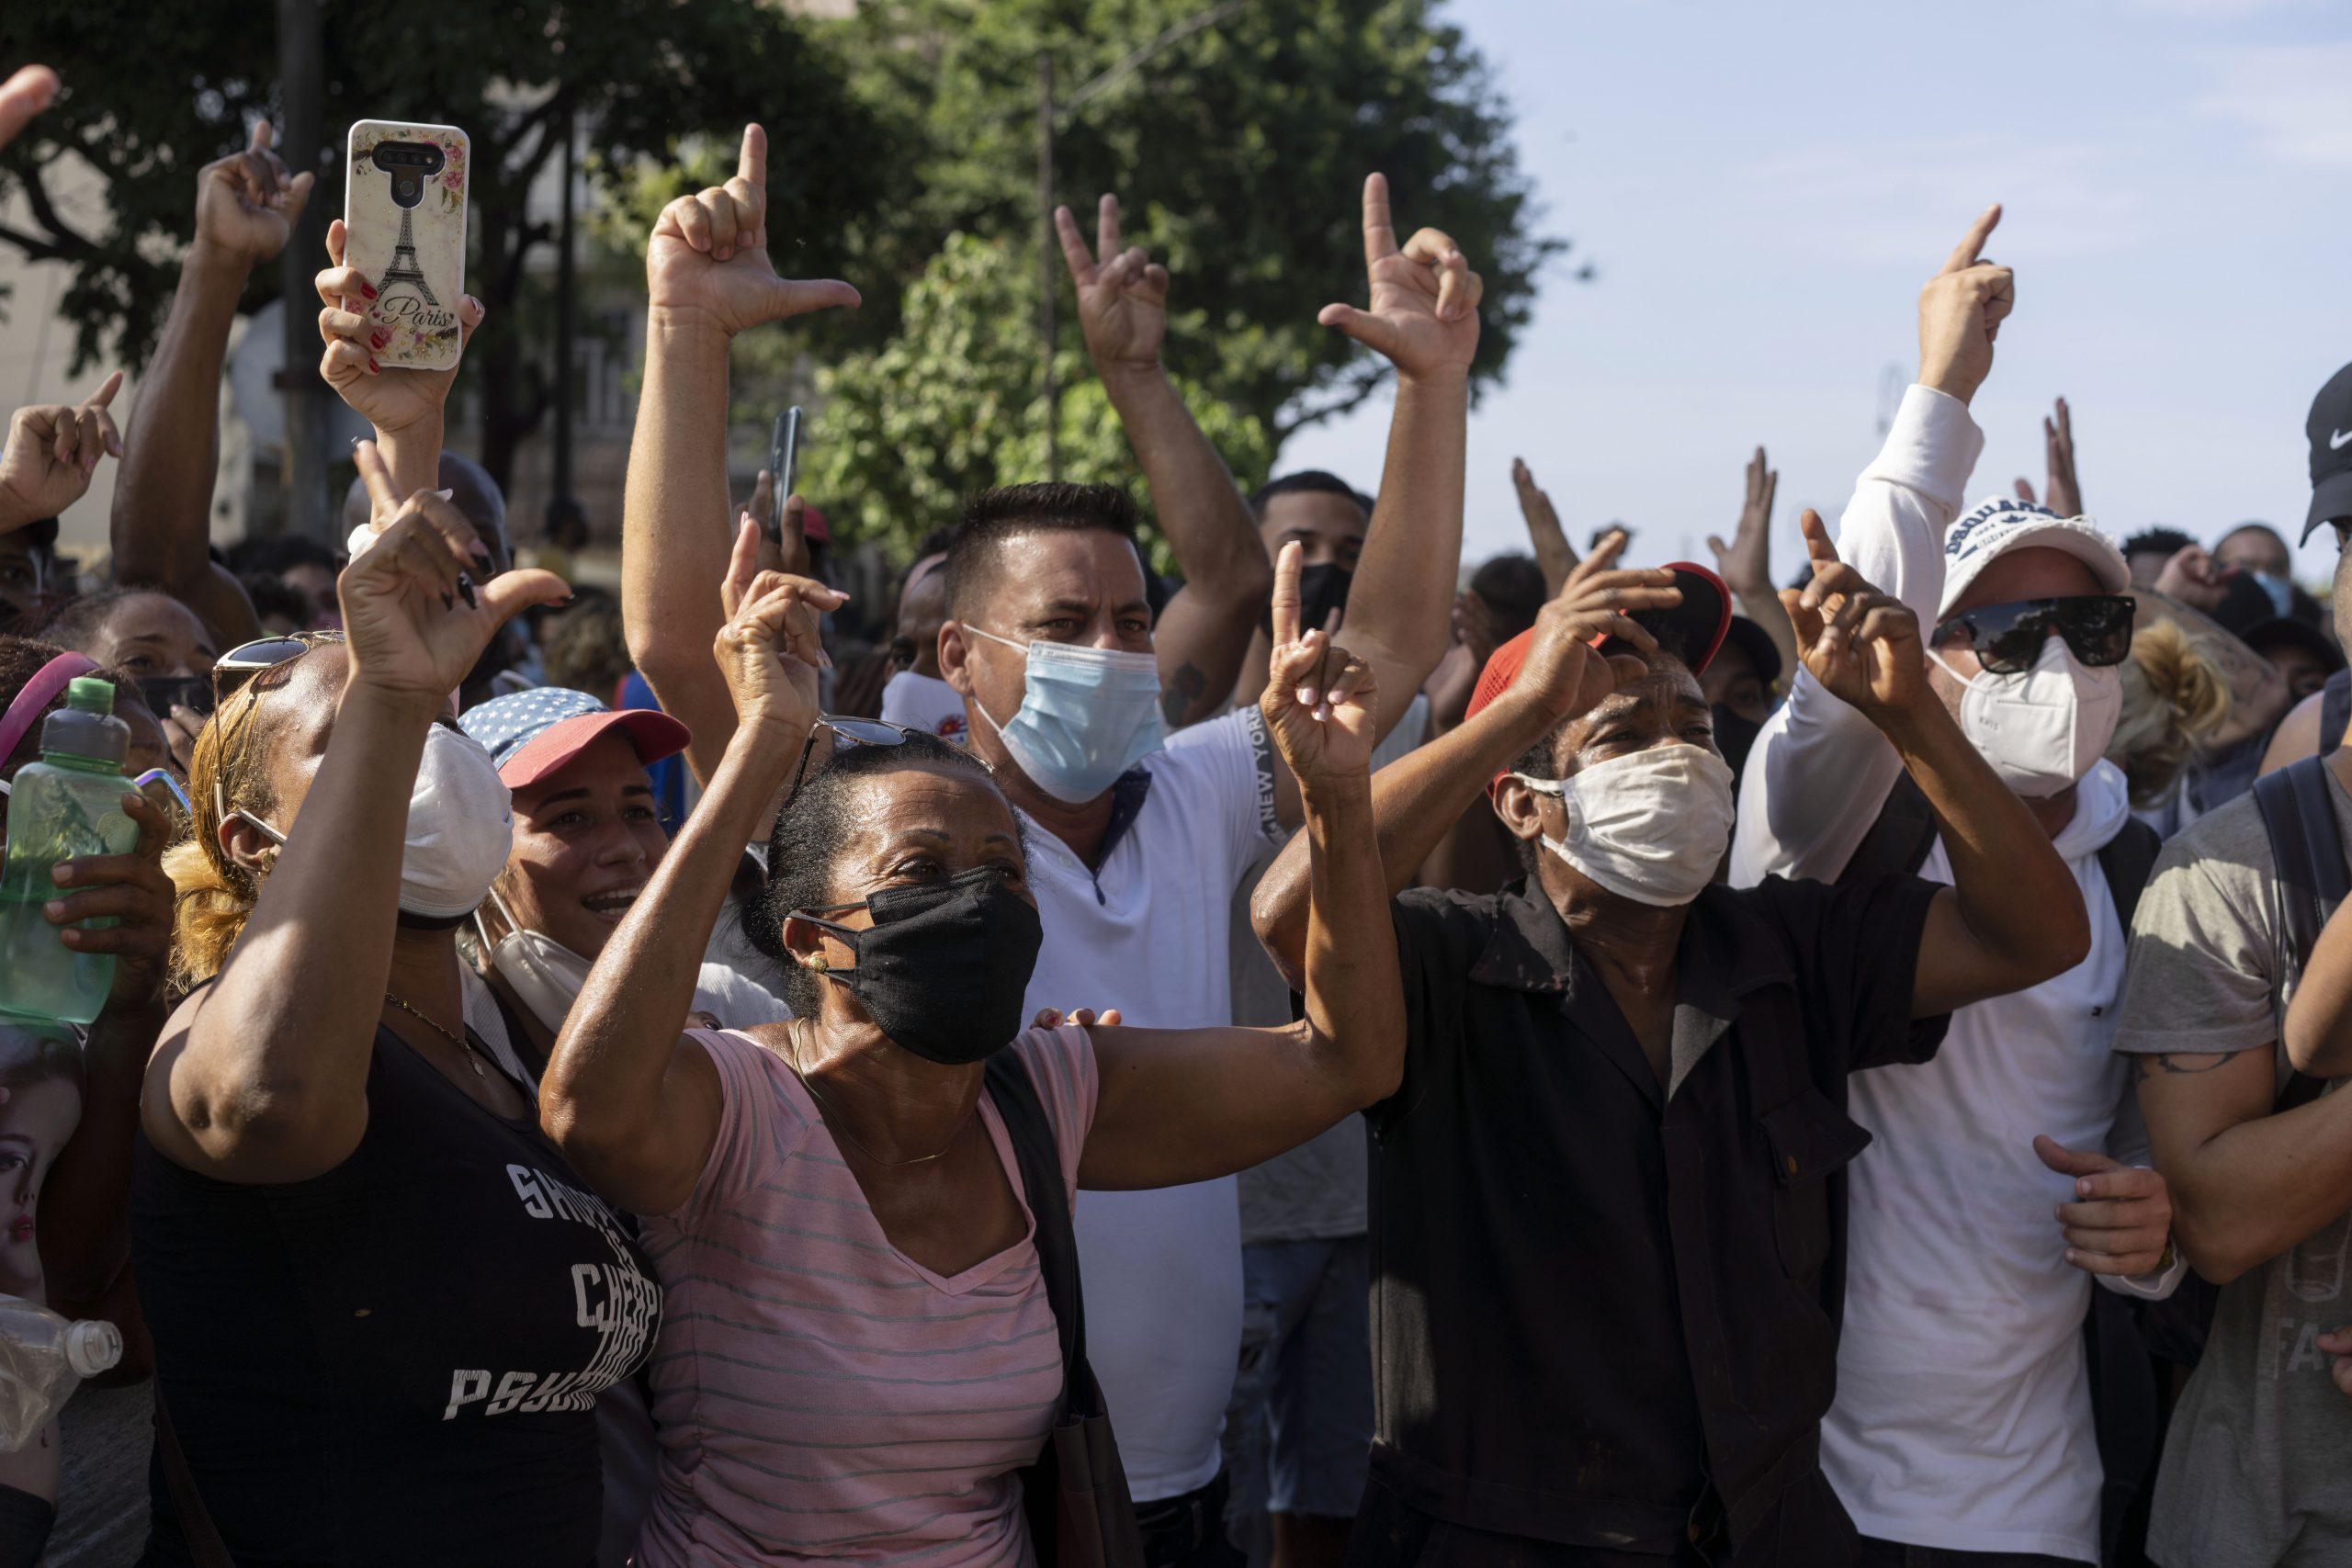 Cubans turn to Radio and Televisión Martí for unprecedented coverage during protests